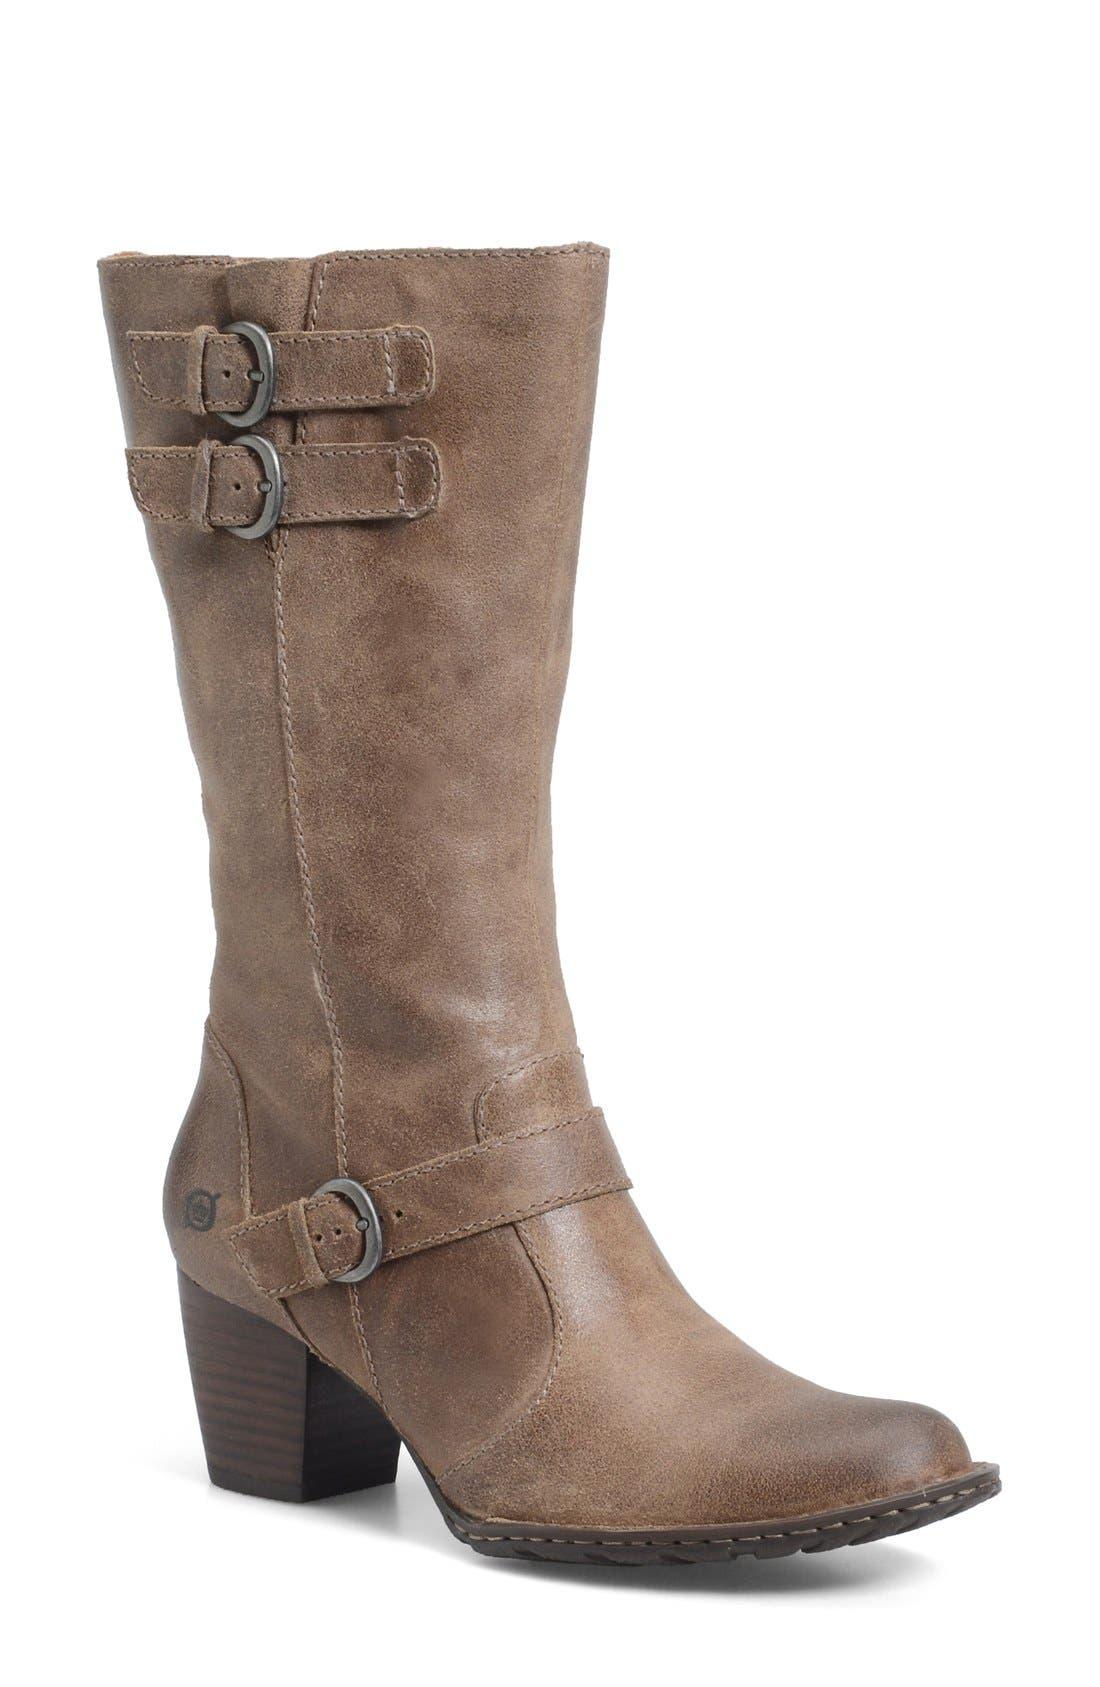 Alternate Image 1 Selected - Børn 'Robyn' Boot (Women)